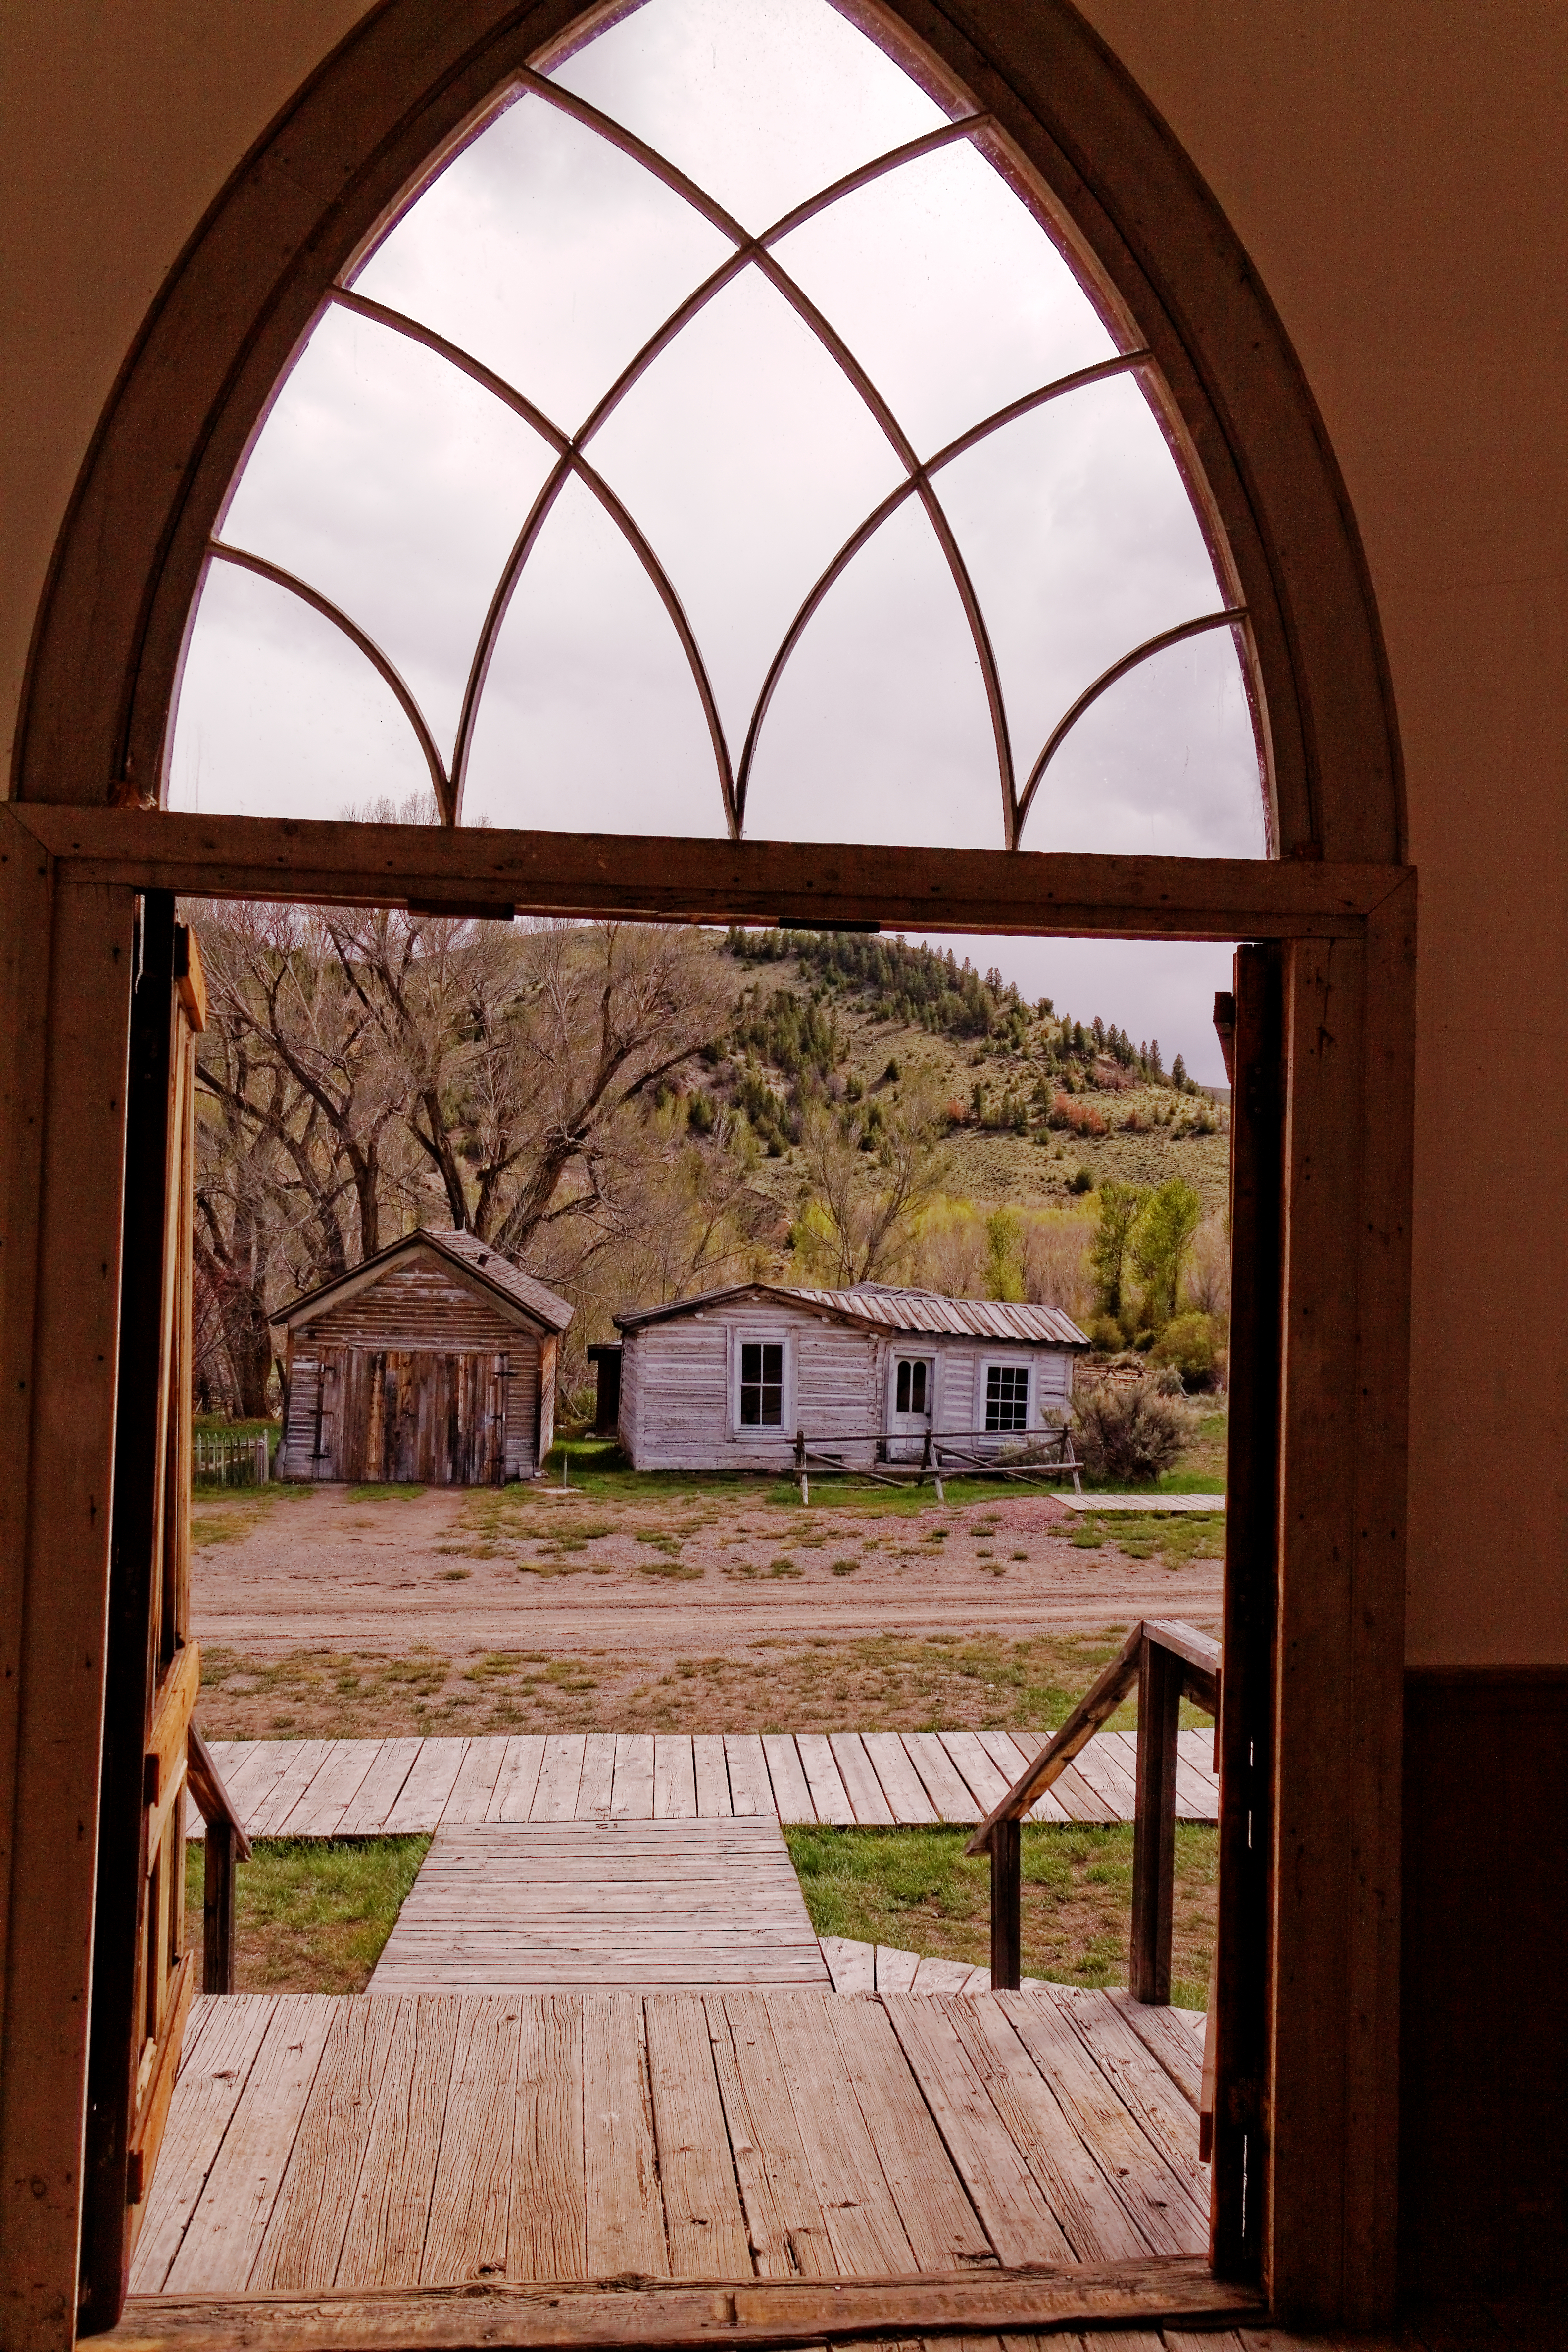 Montana beaverhead county polaris - Montana Bannack Beaverheadcounty Bannackstatepark Ruralmontana Bannackghosttown Southwesternmontana Canonefs18135mmf3556is Montanaterritorialcapital